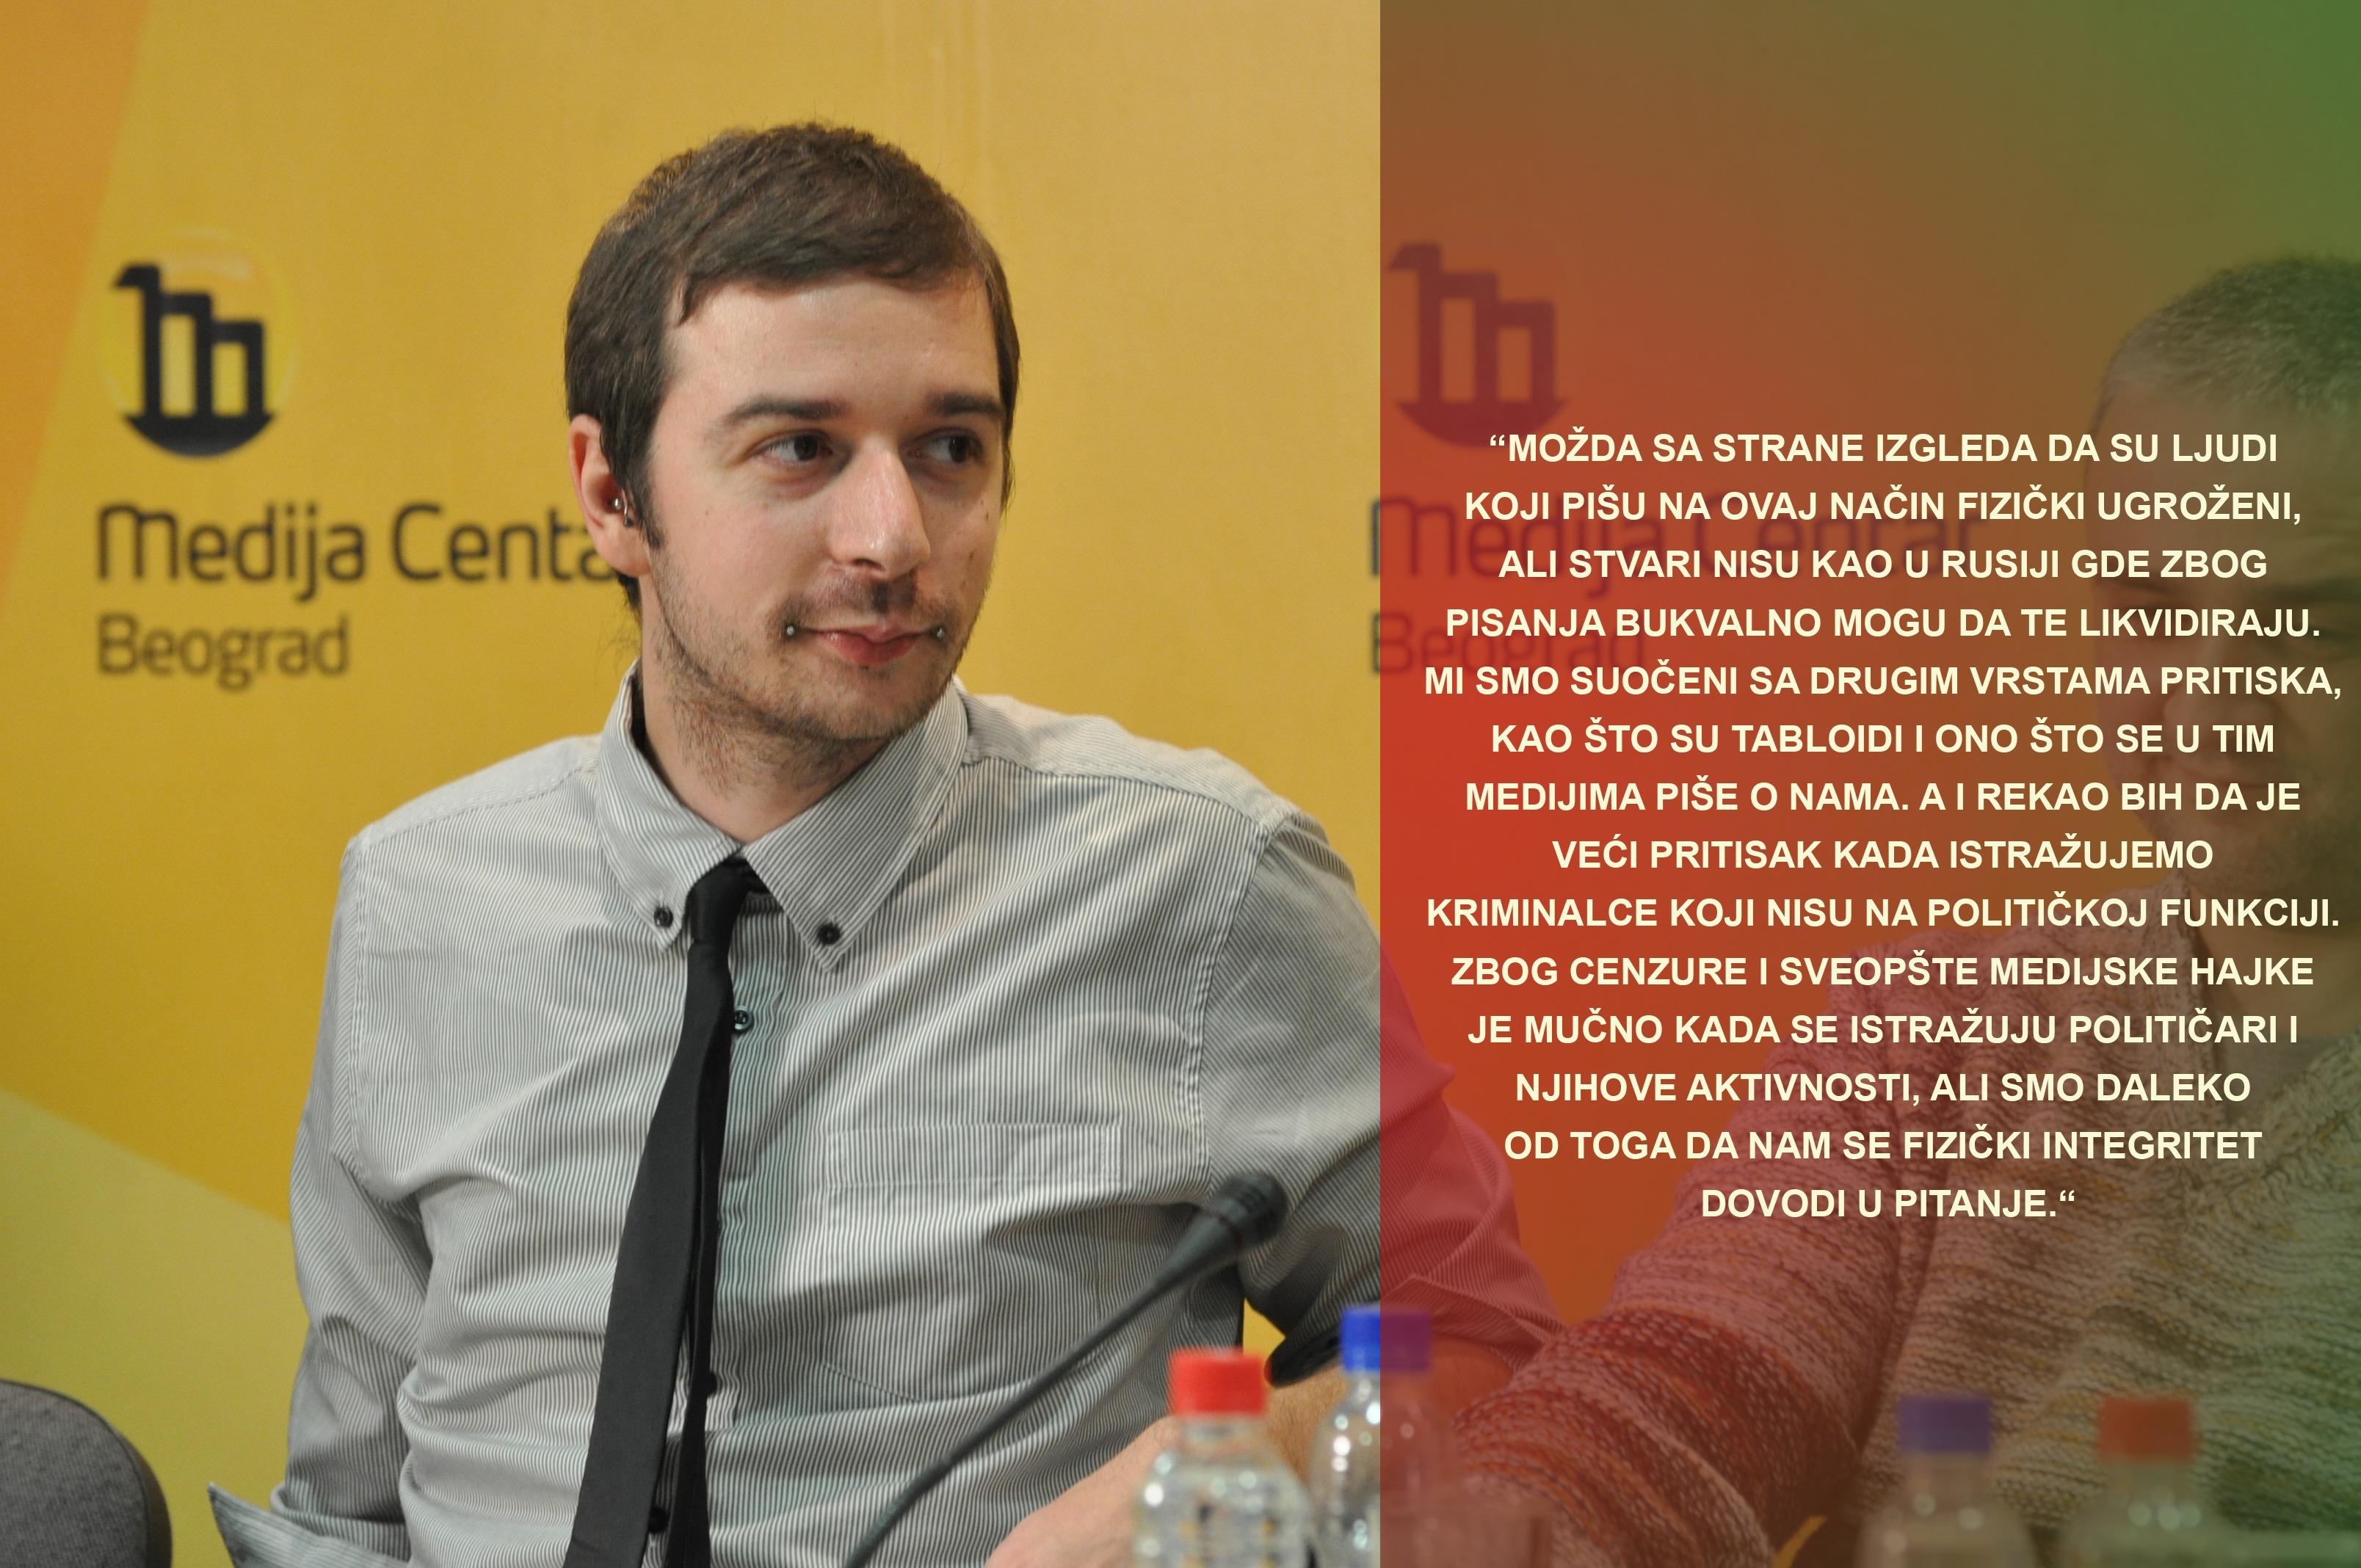 Photo: Medija Centar